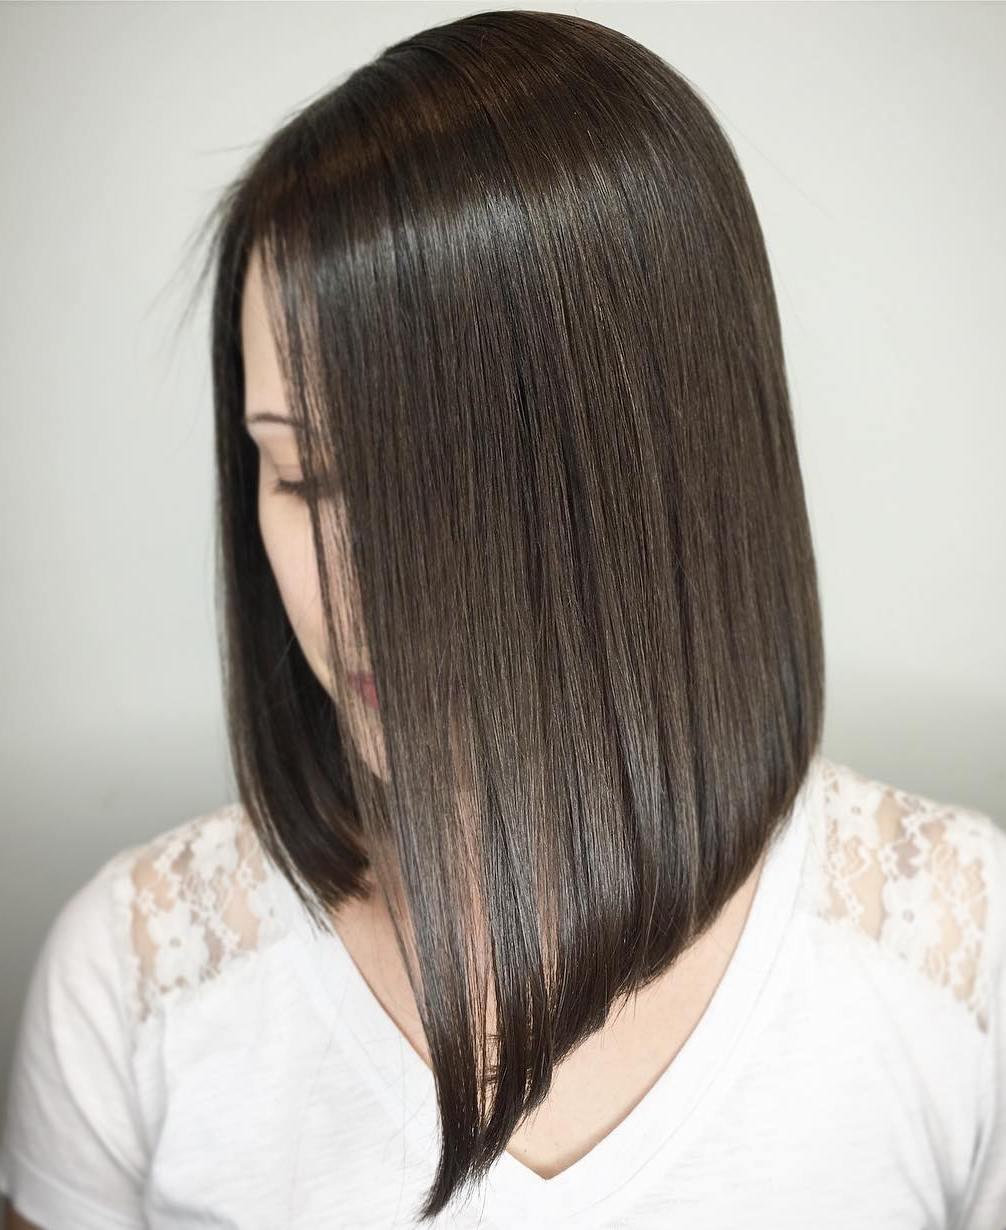 Swell 50 Luscious Long Bob Hairstyles Hair Adviser Schematic Wiring Diagrams Amerangerunnerswayorg